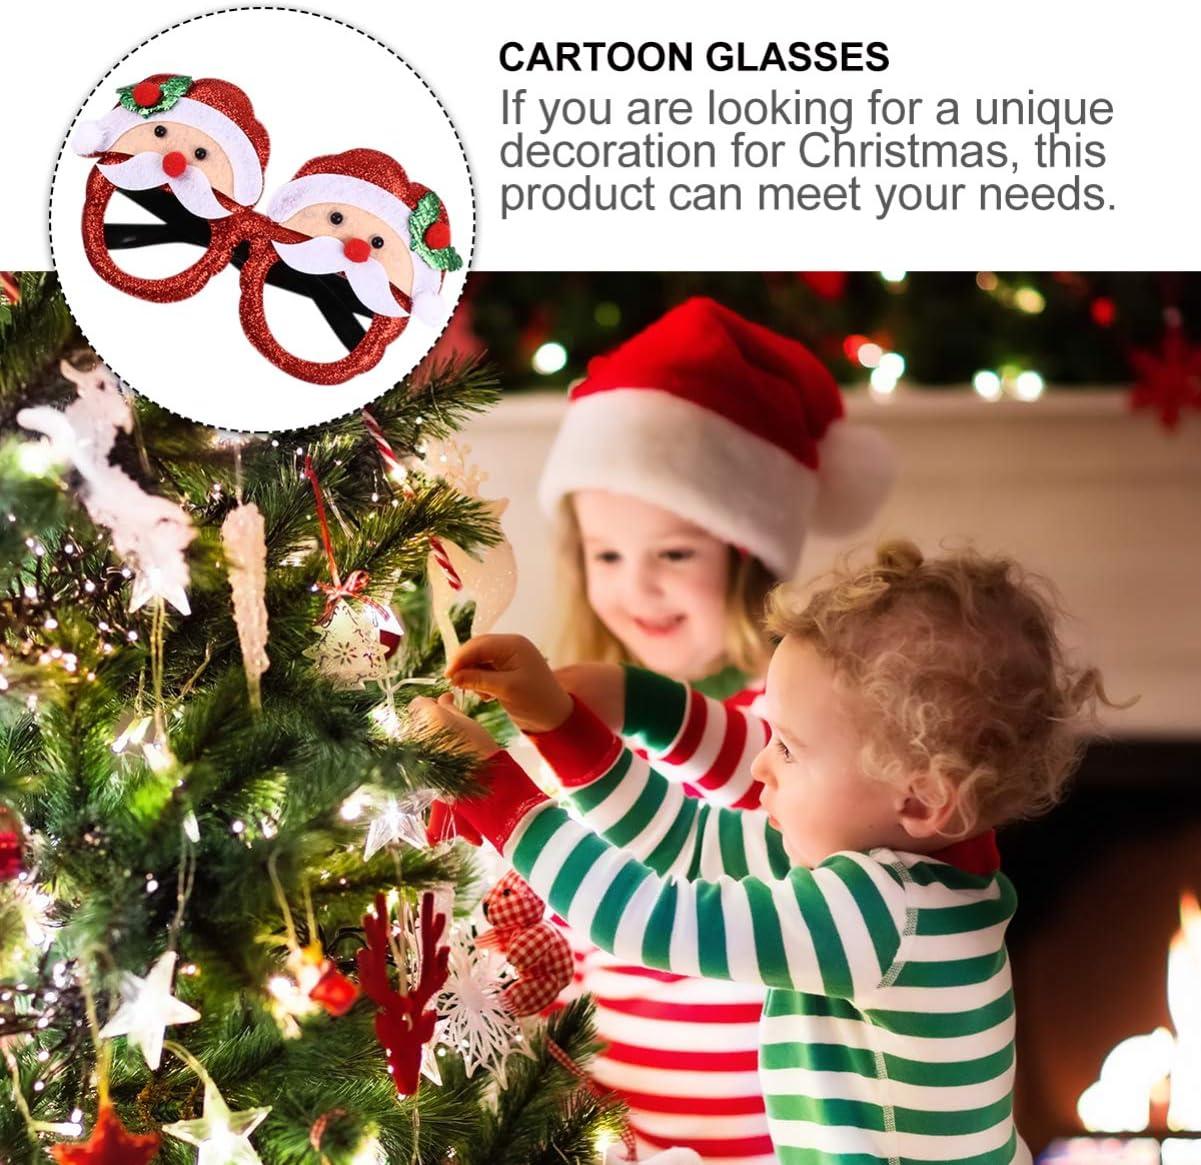 Amosfun 4Pcs Christmas Party Glasses Santa Snowman Hats 2021 Happy New Year Eyeglasses Frames Party Costume Eyewear Photo Props for Xmas Holiday Party Style 1